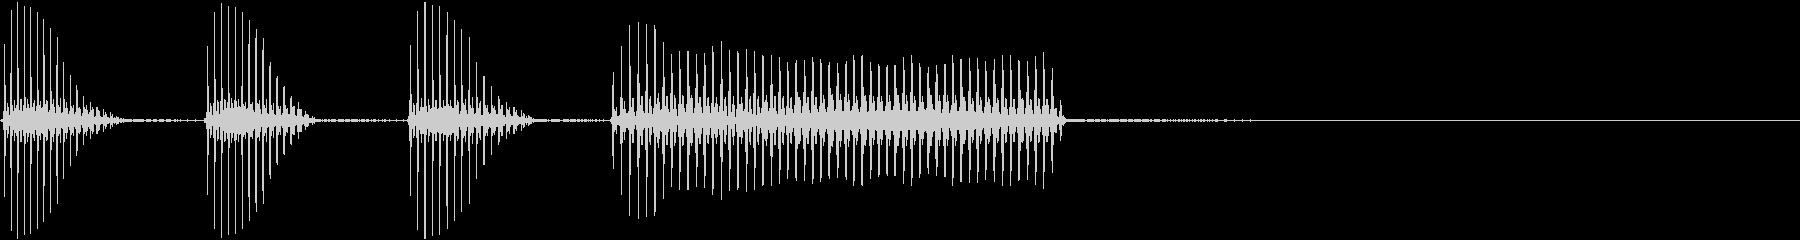 TUBA:ランバーダウン、漫画コメ...の未再生の波形